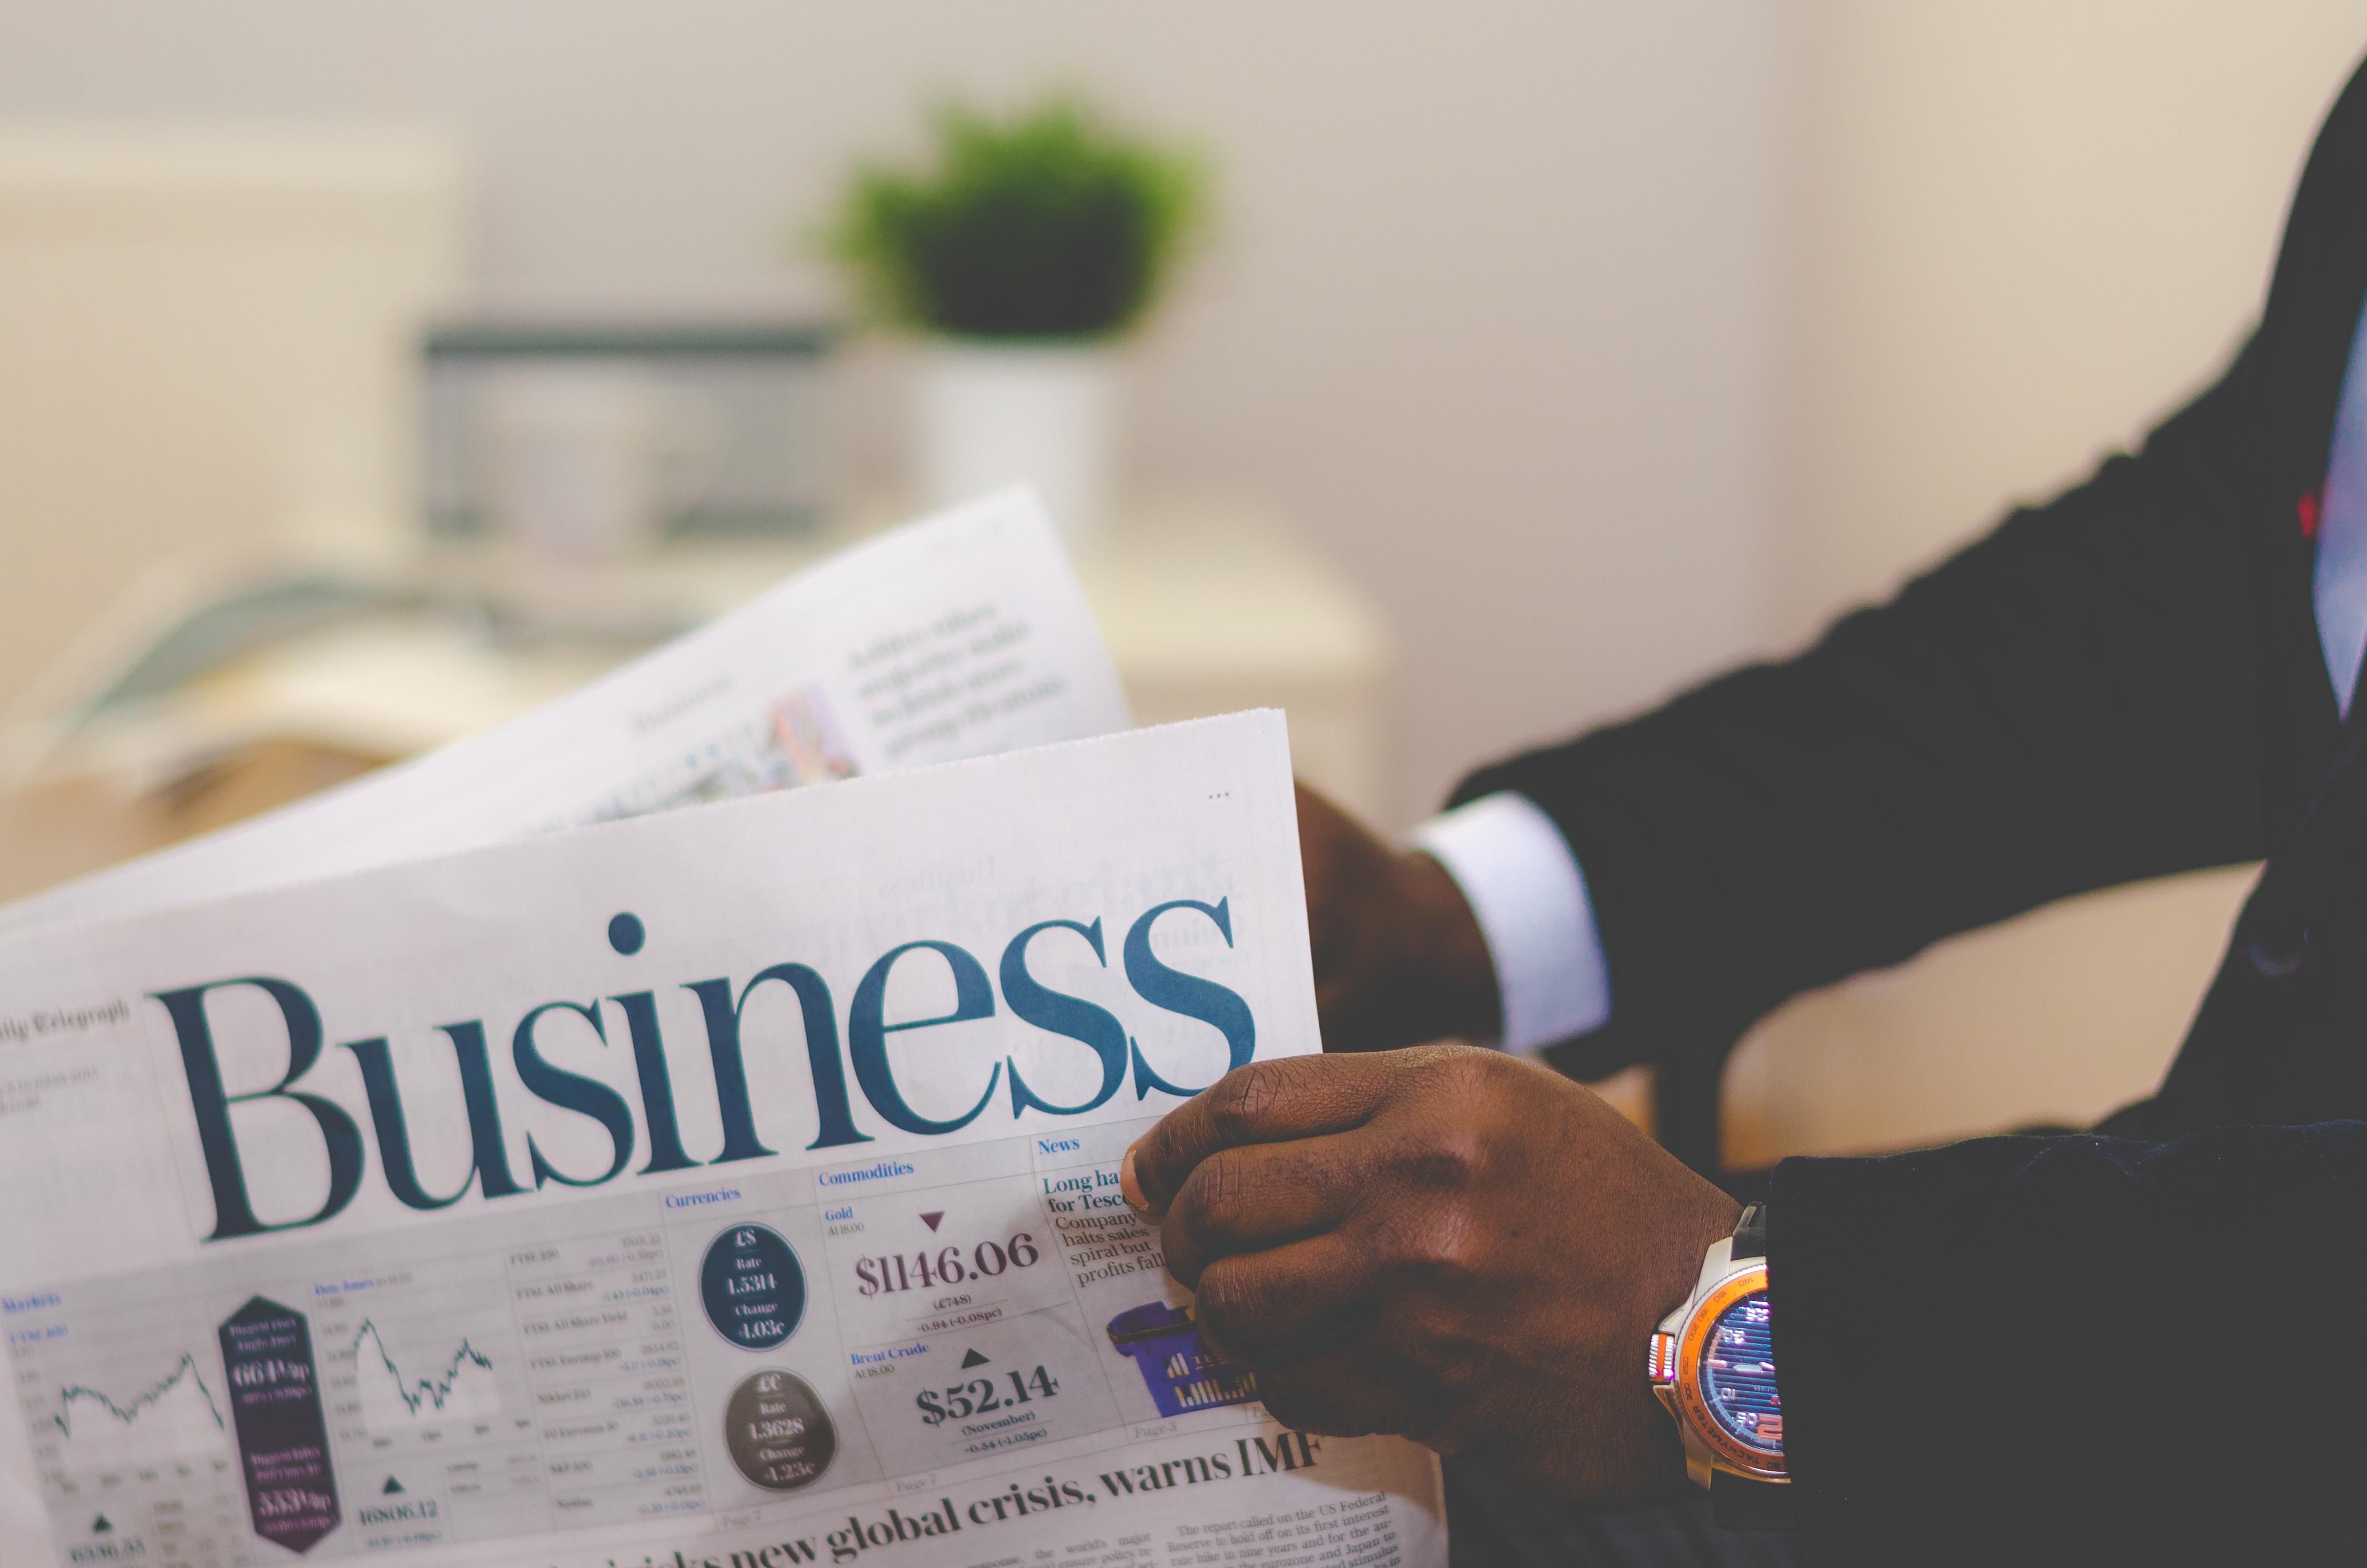 Business English phrasal verbs